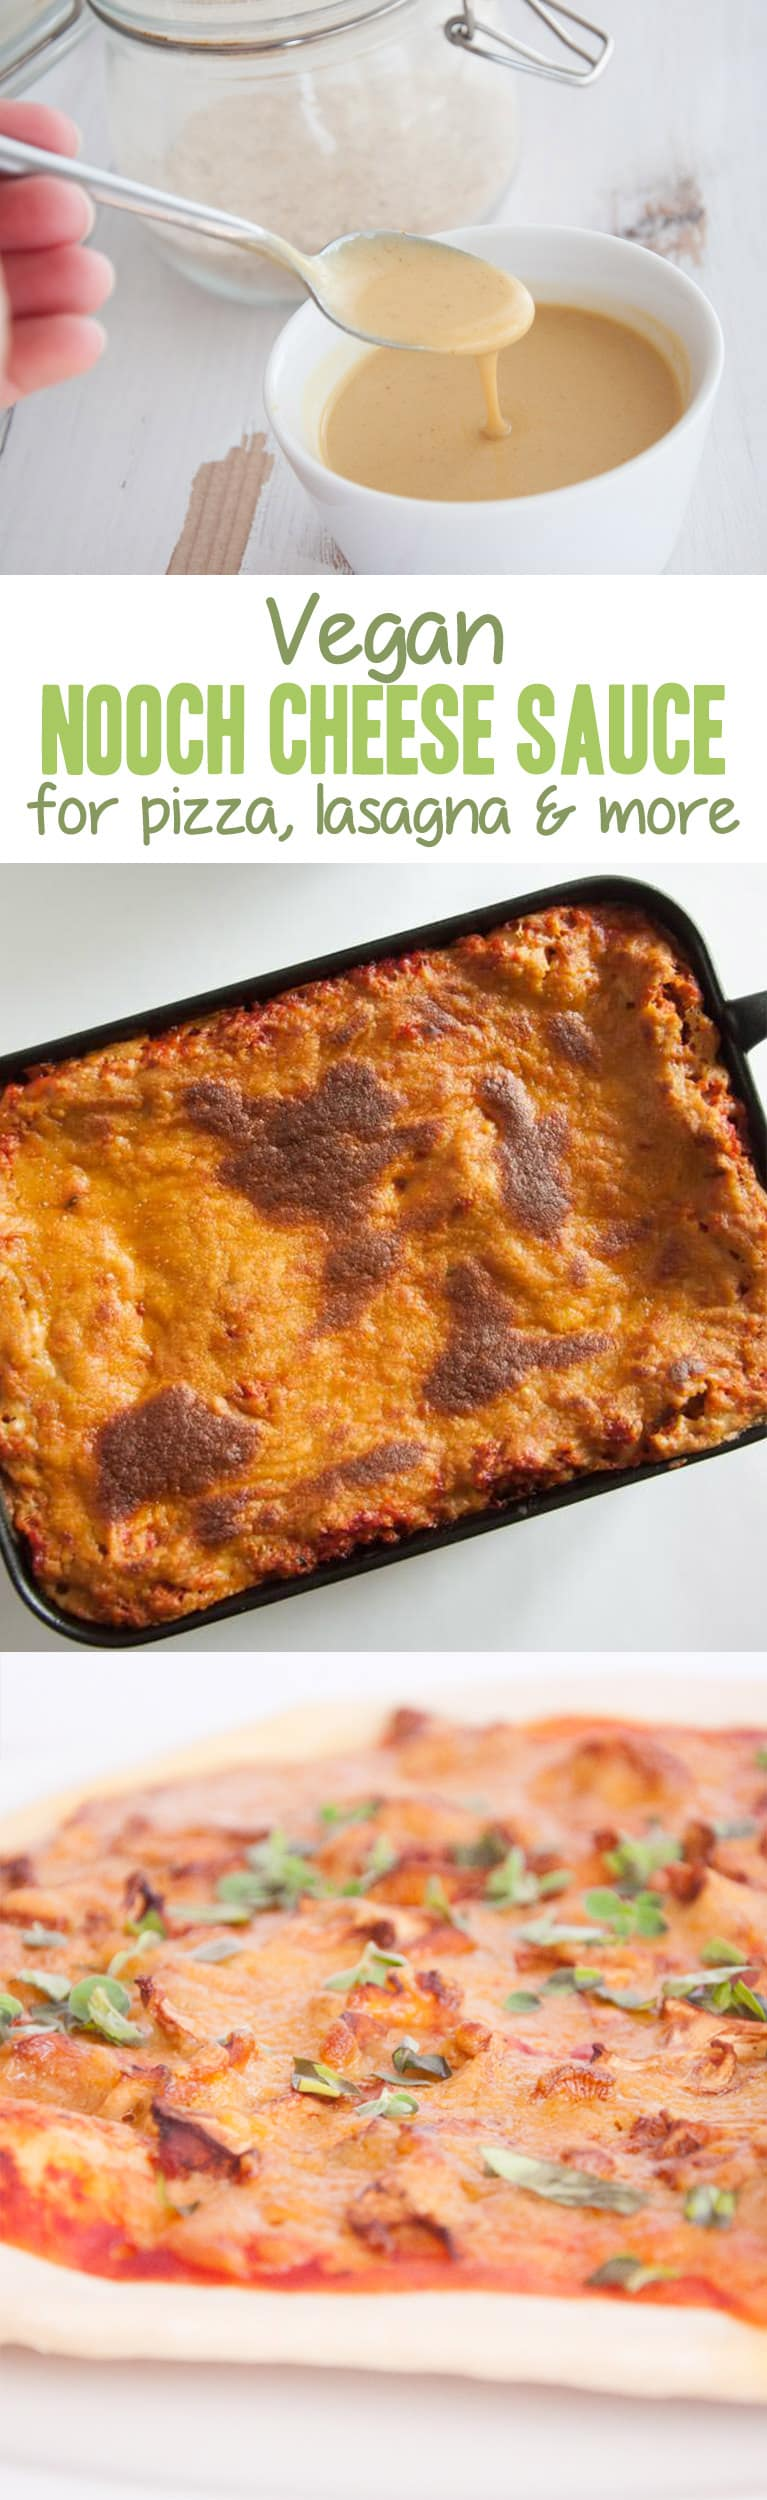 Nooch Cheese Sauce - vegan | ElephantasticVegan.com